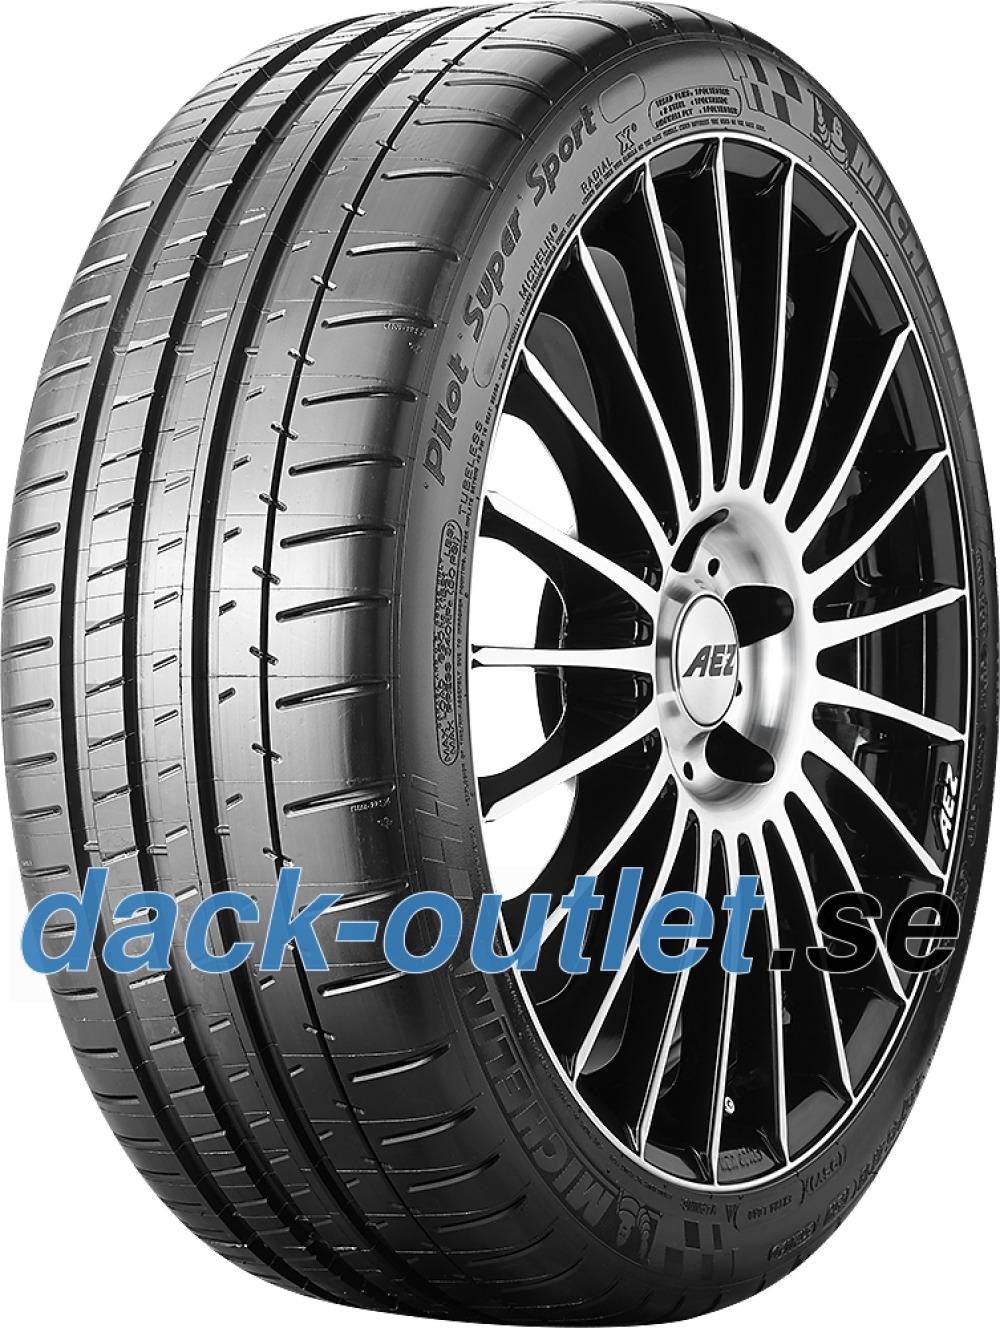 Michelin Pilot Super Sport ( 275/35 ZR20 (102Y) XL *, med fälg skyddslist (FSL) )